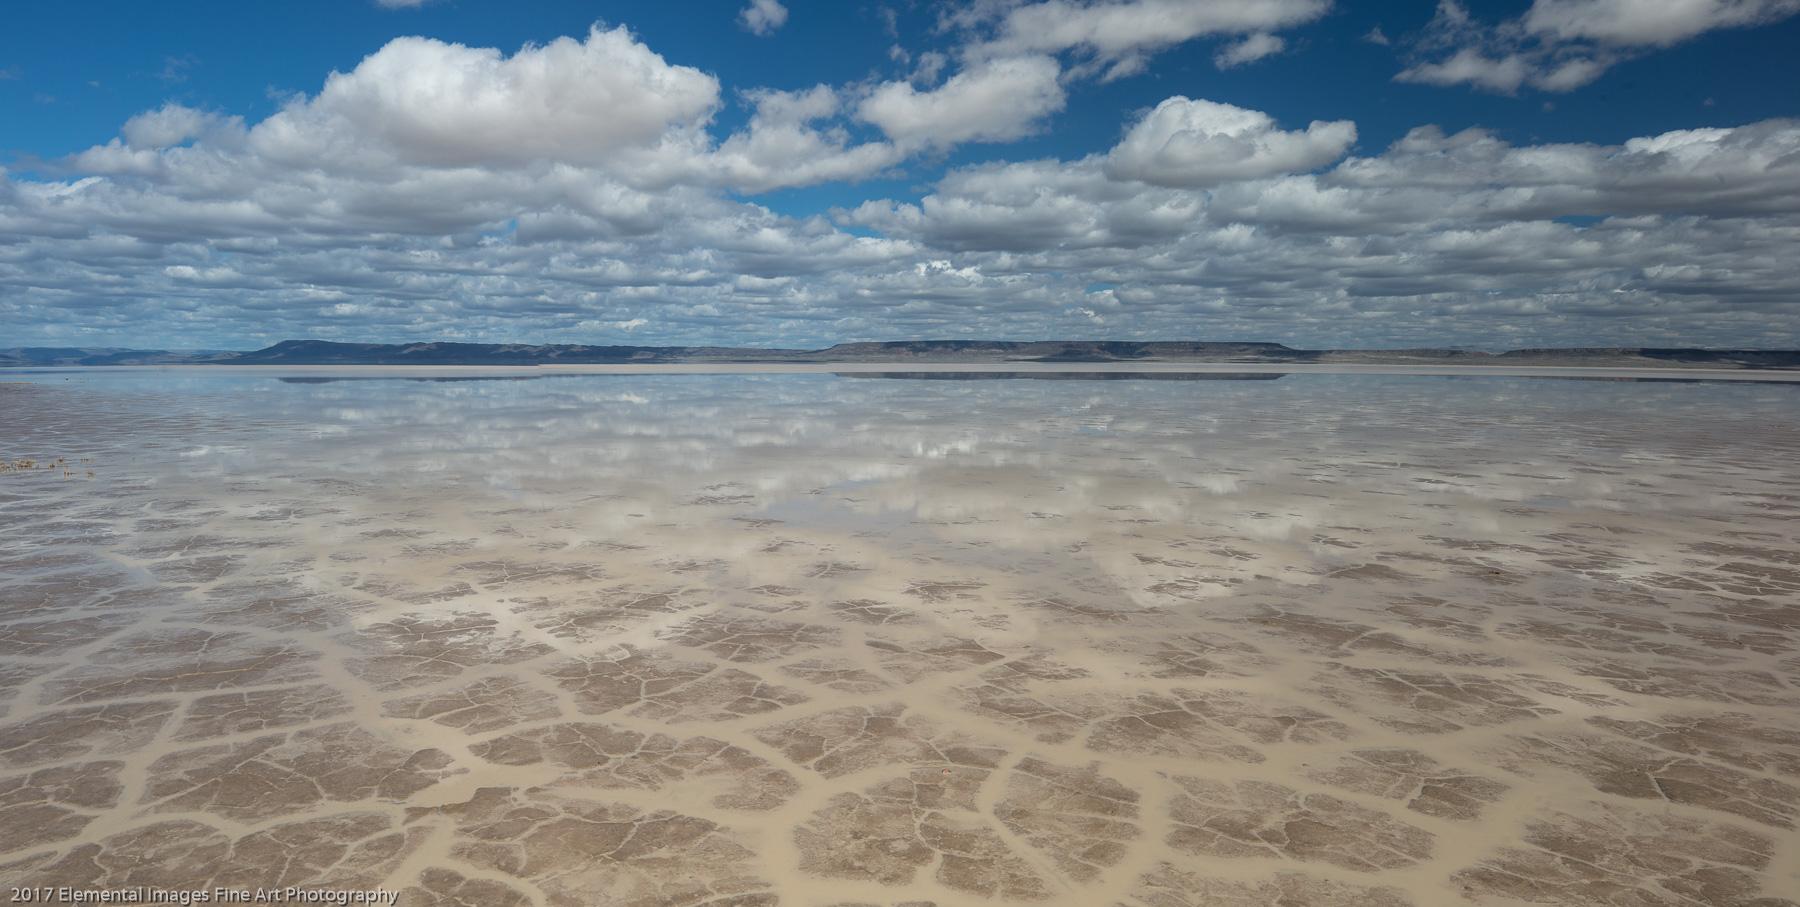 Desert Playa | Alvord Desert | OR | USA - © 2017 Elemental Images Fine Art Photography - All Rights Reserved Worldwide